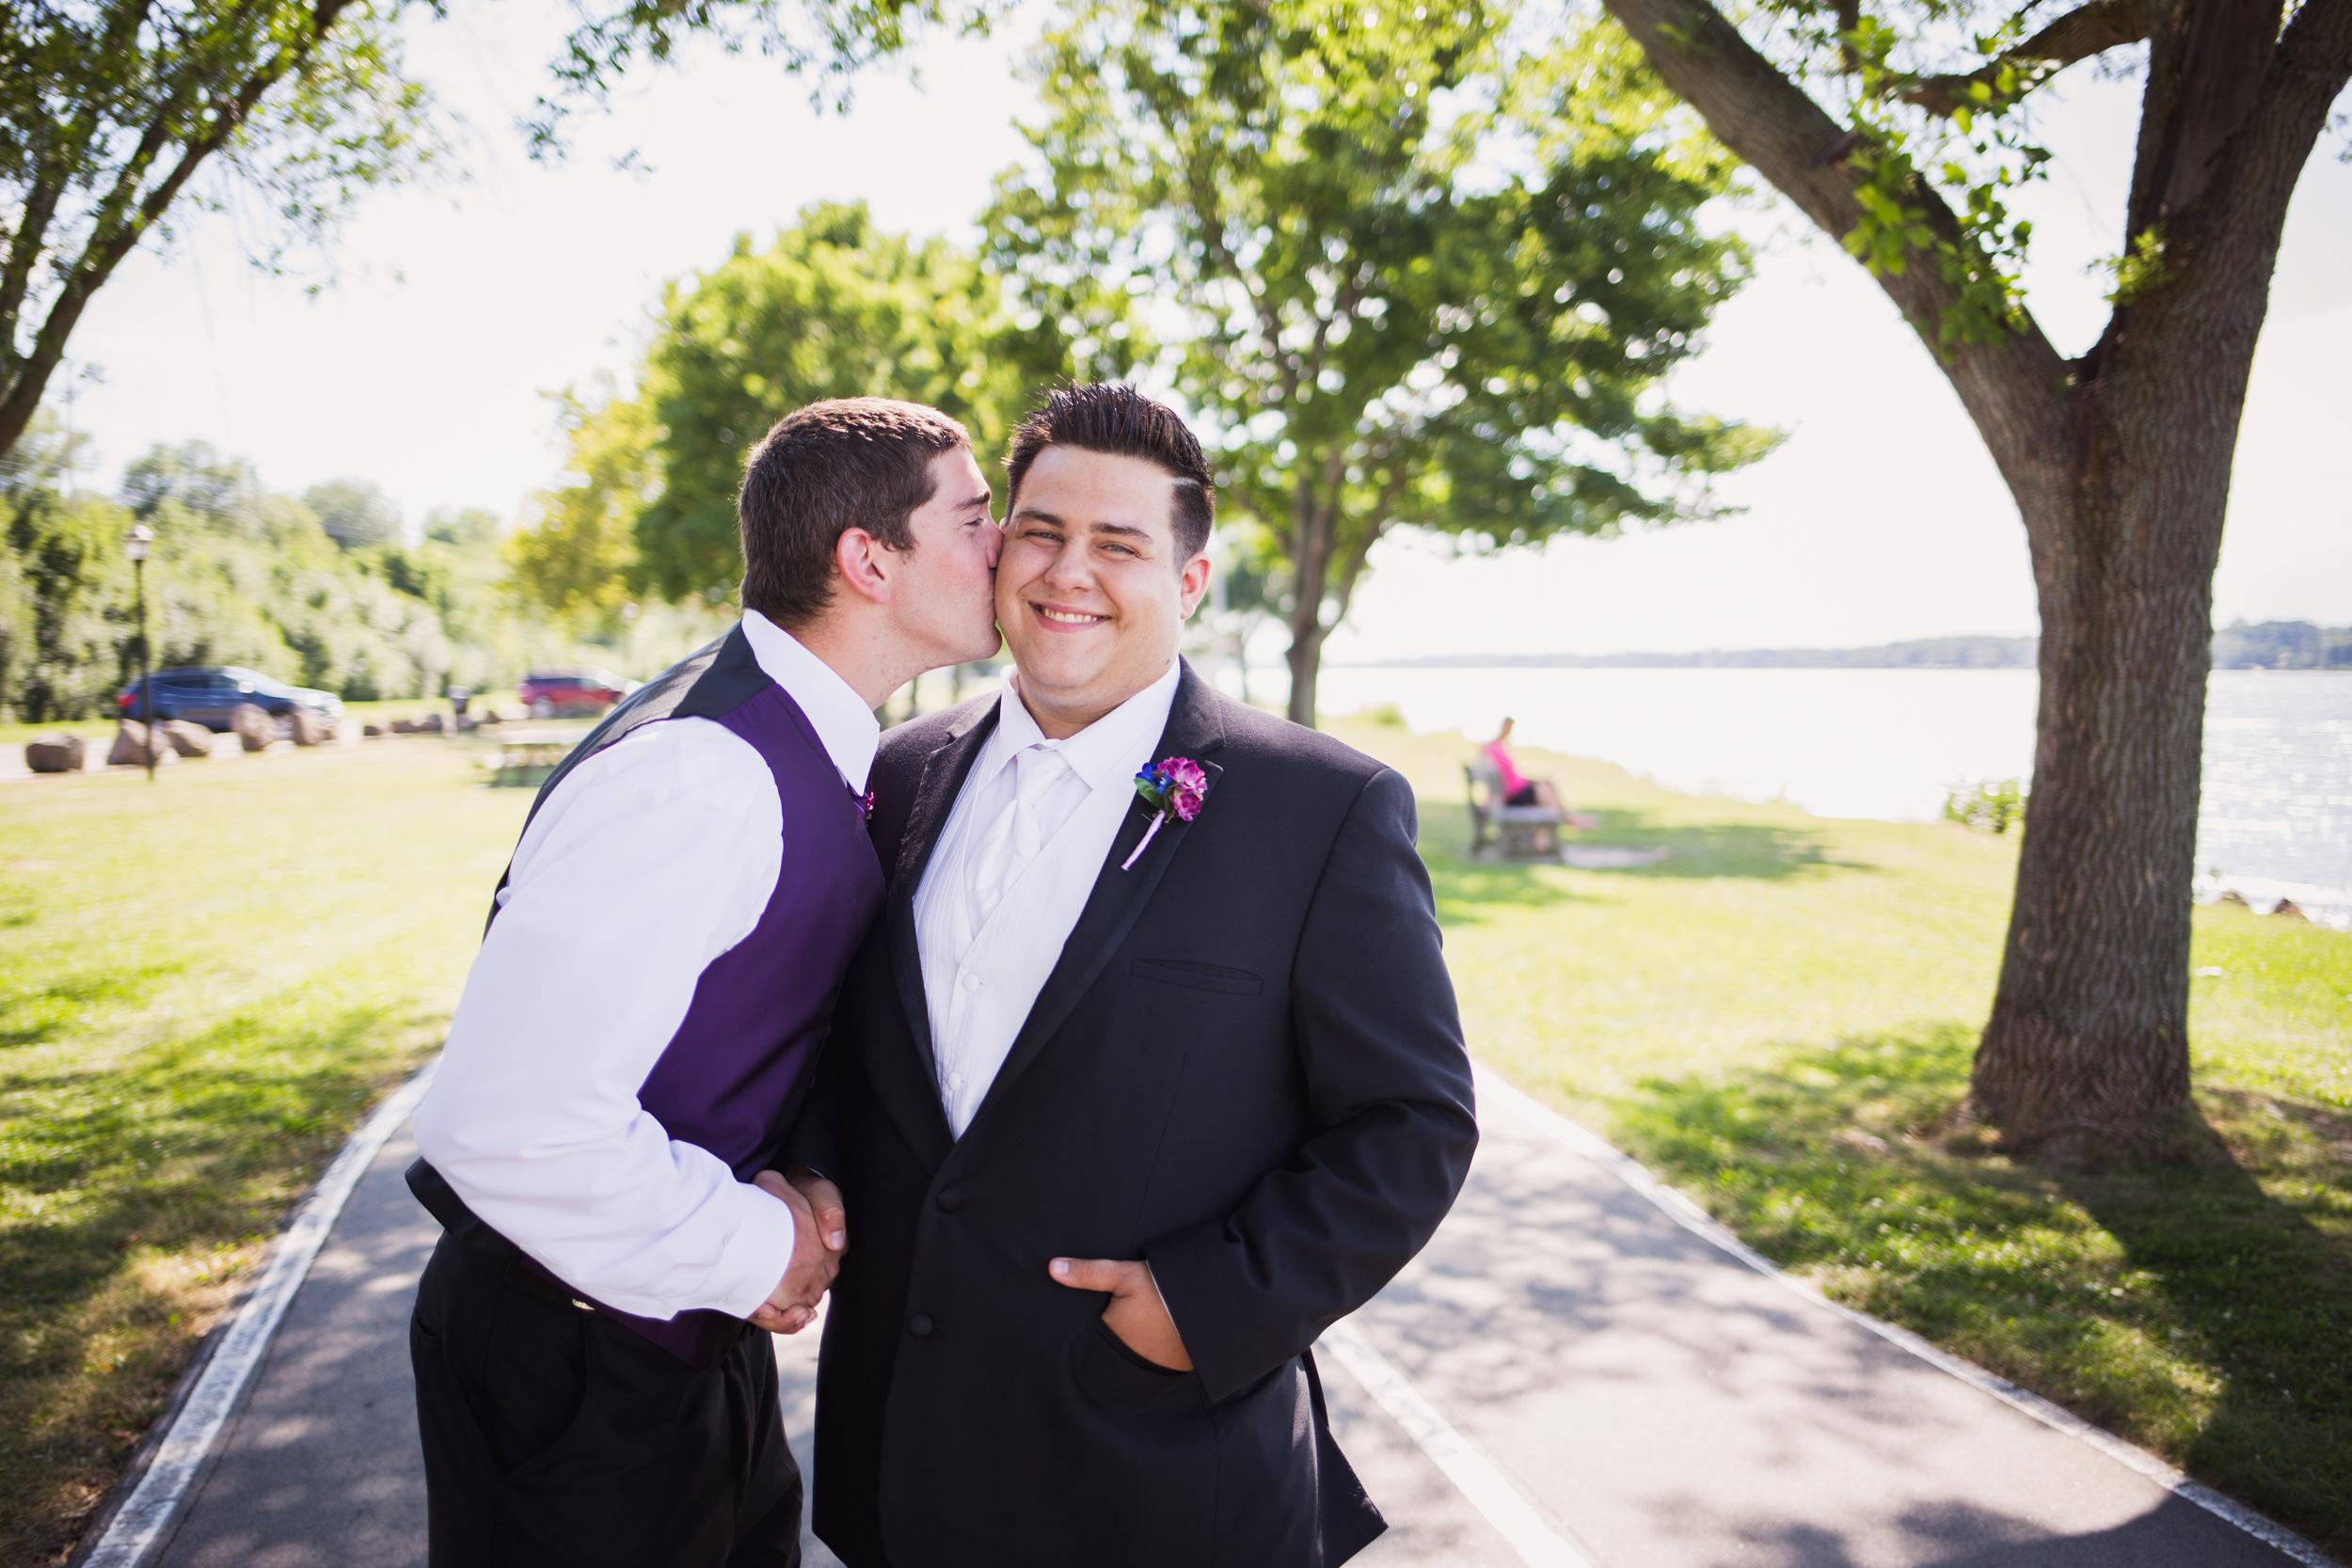 Stephanie-and-Mitchell-Buffalo-NY-Wedding-Stefan-Ludwig-Photography-32.jpg